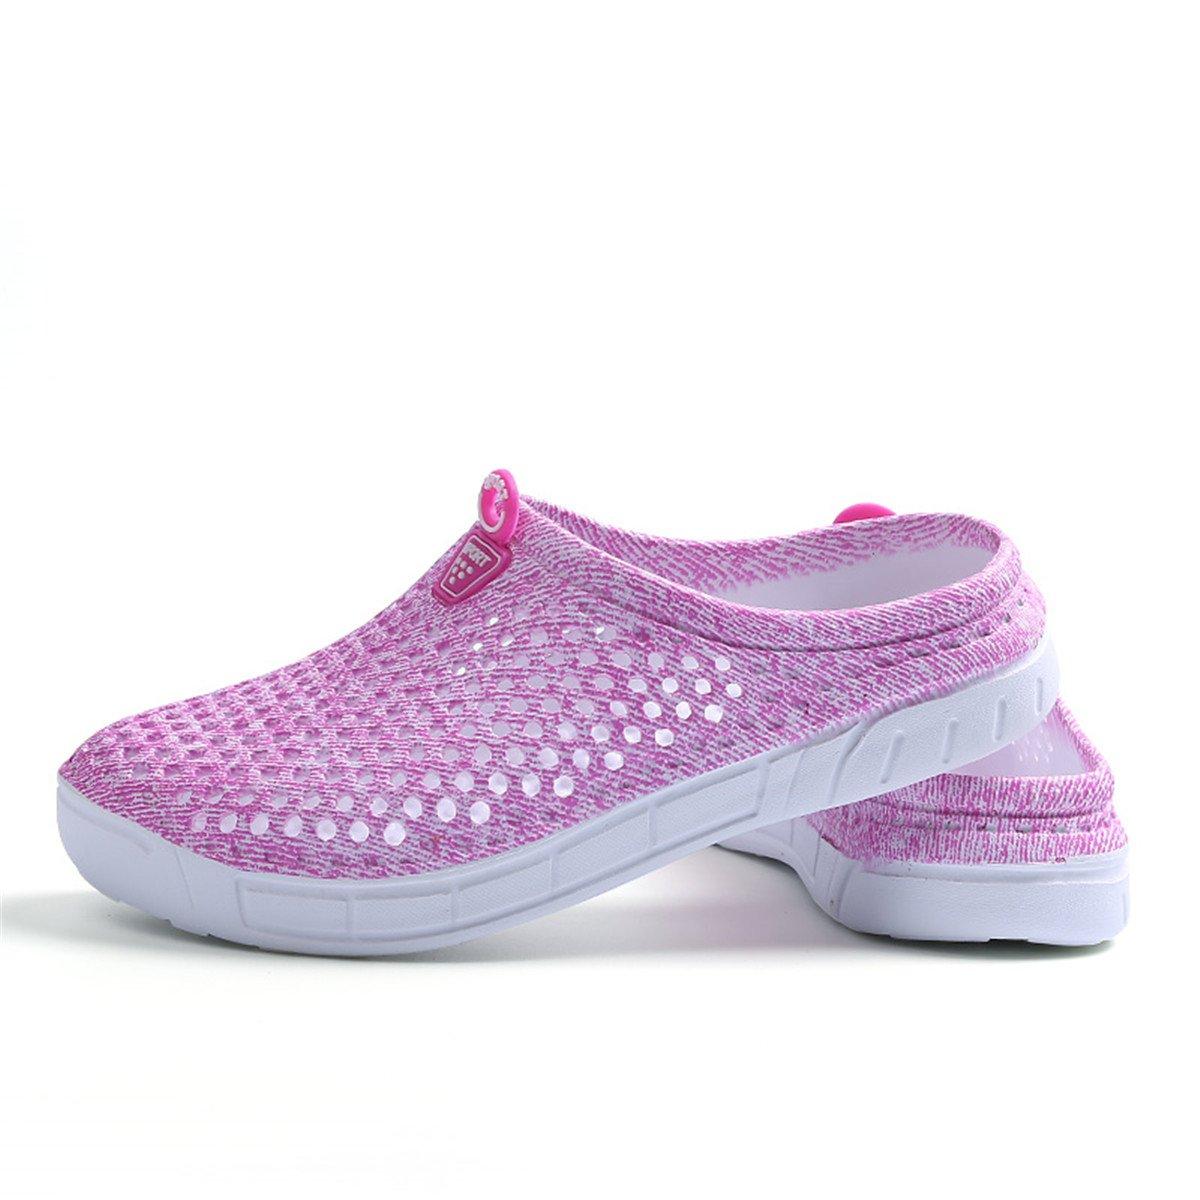 Ginjang Women's Garden Clogs Shoes Slip-on Slippers Sandals(39/Pink) by Ginjang (Image #4)